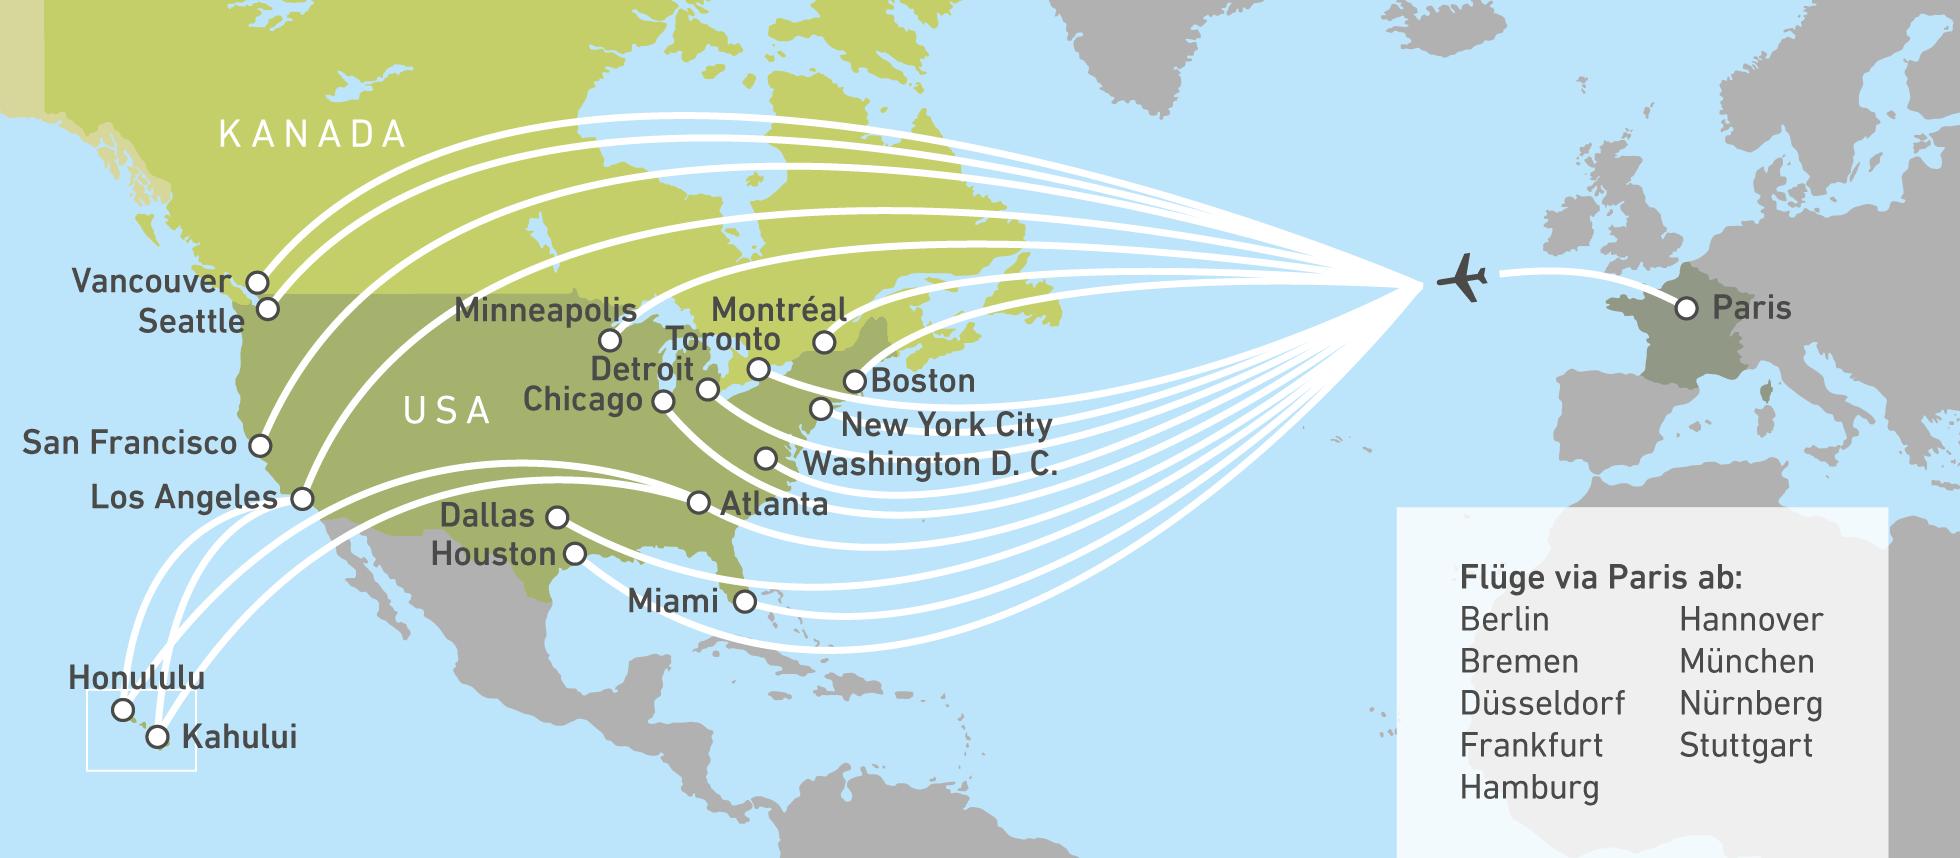 Air France über Paris Nach Nordamerika Canusa